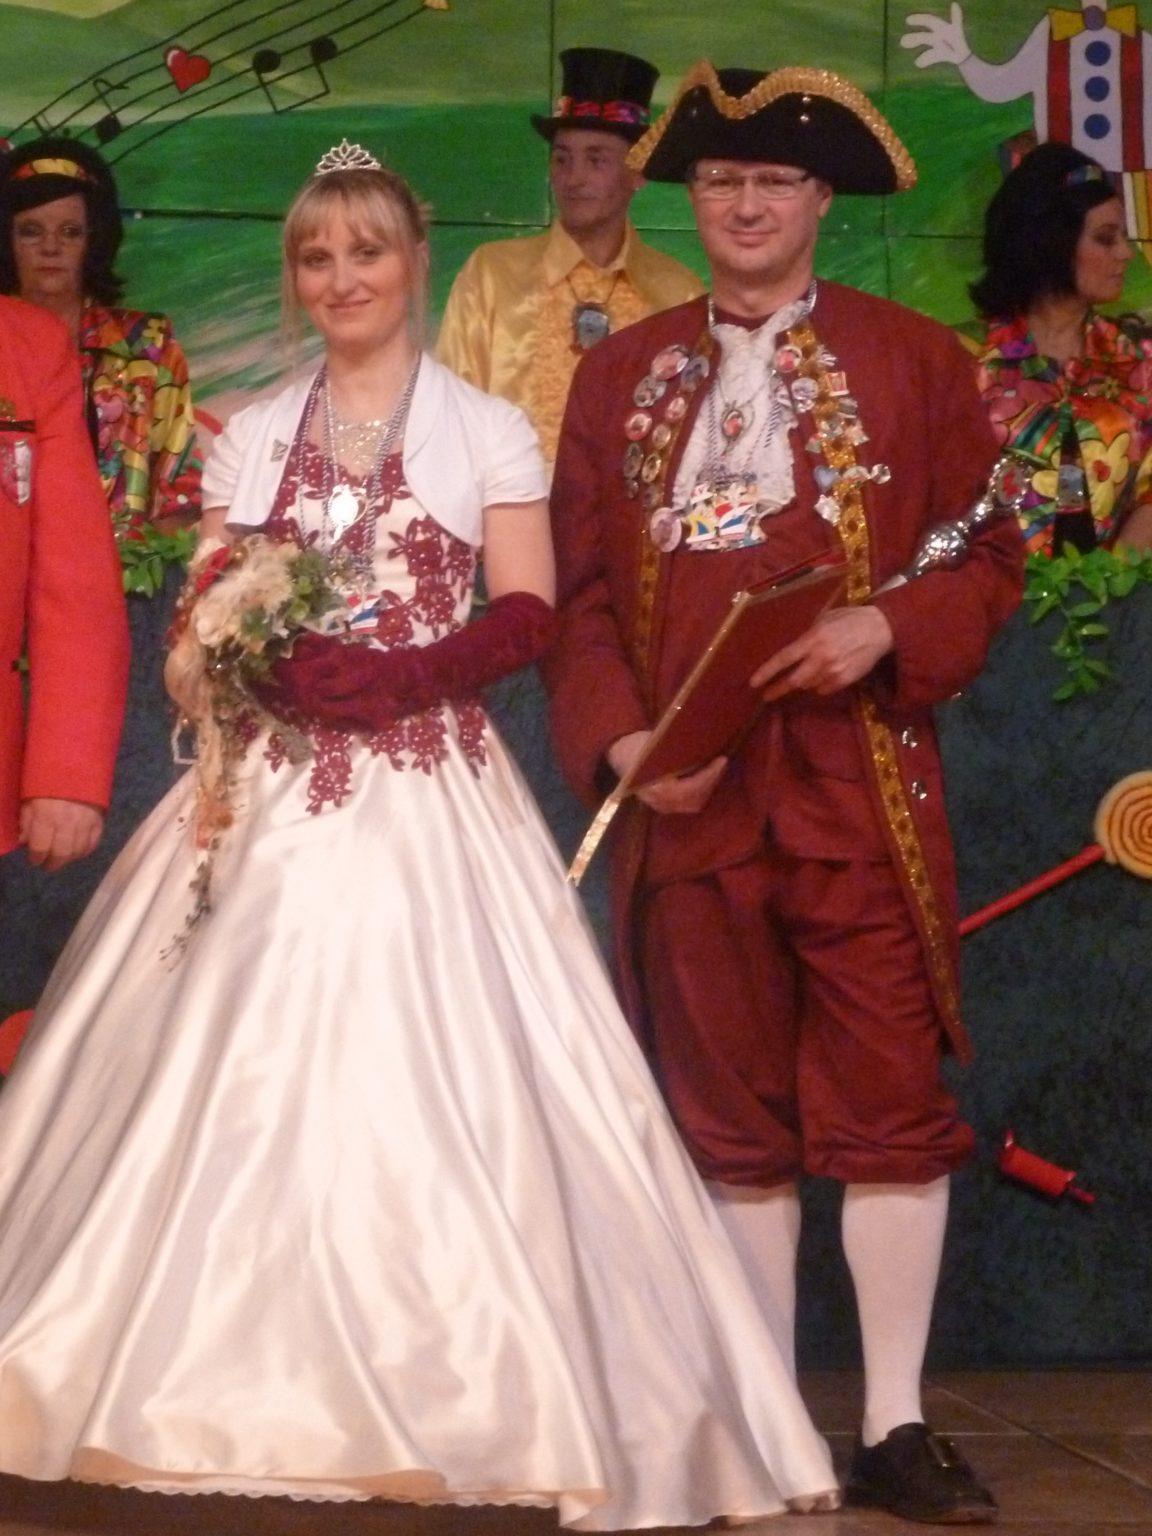 Prinzenpaar Stadtfeld&Grünagel